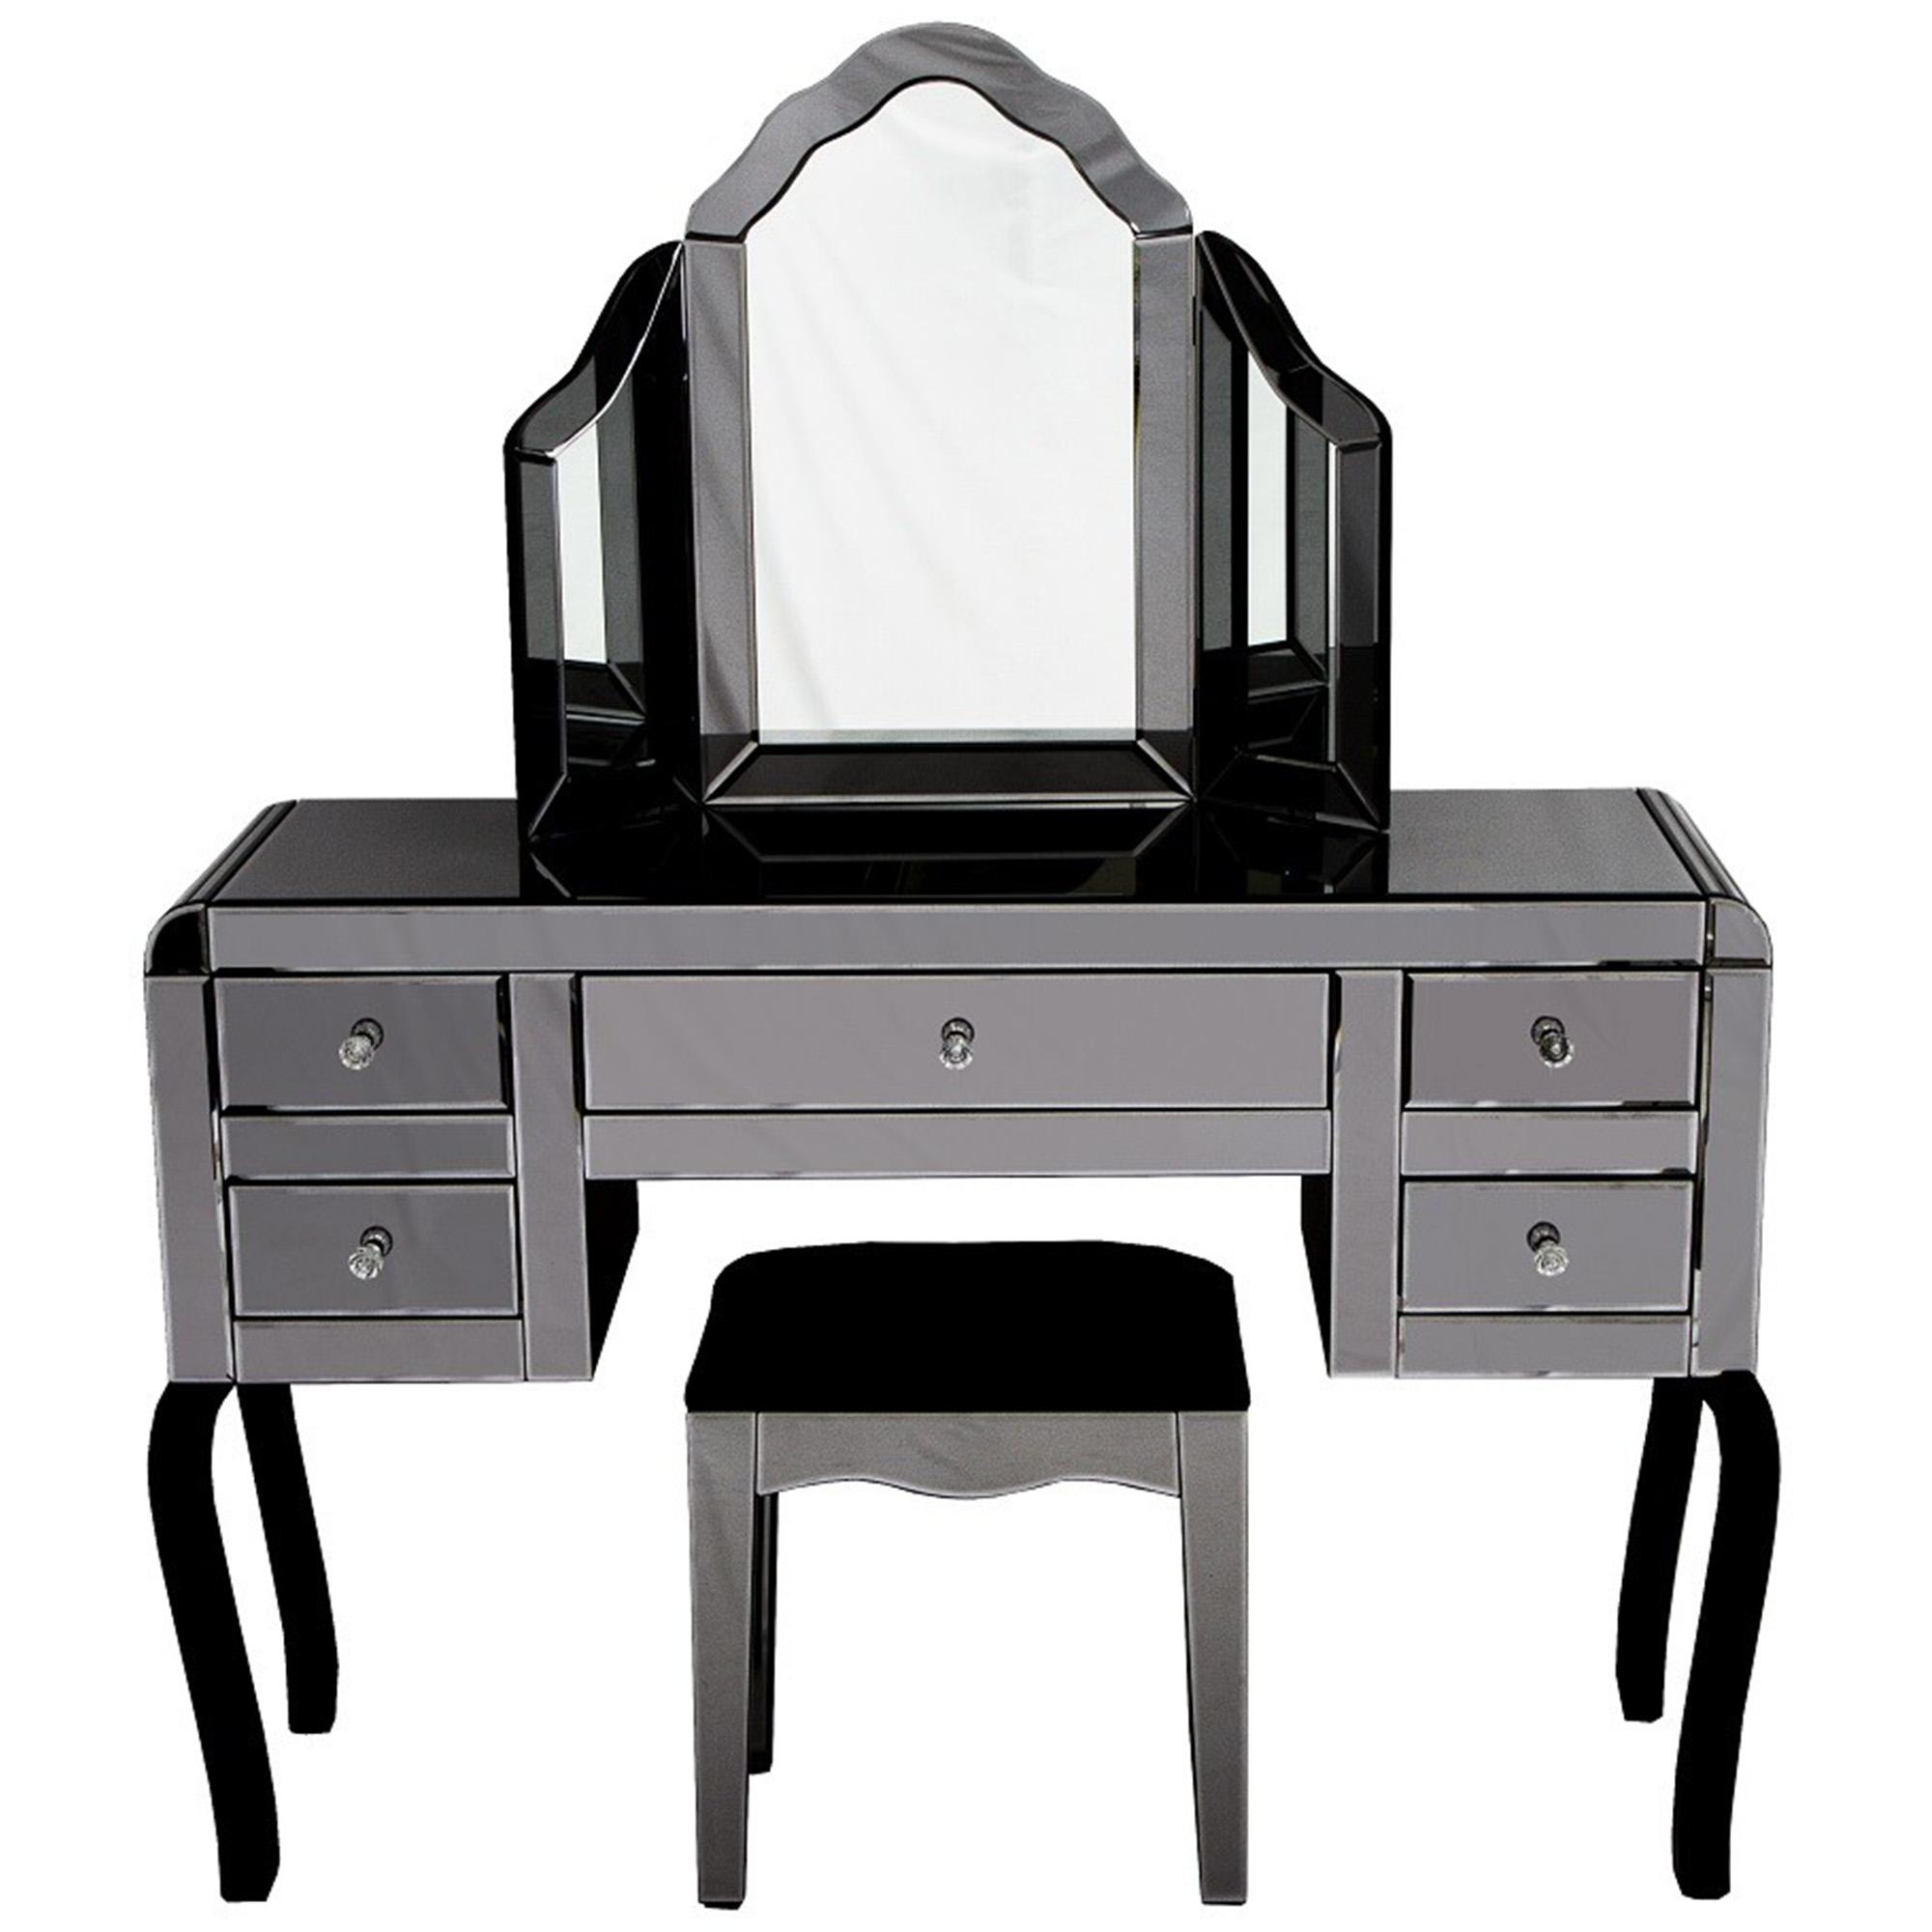 Smokey Mirrored Dressing Table Set